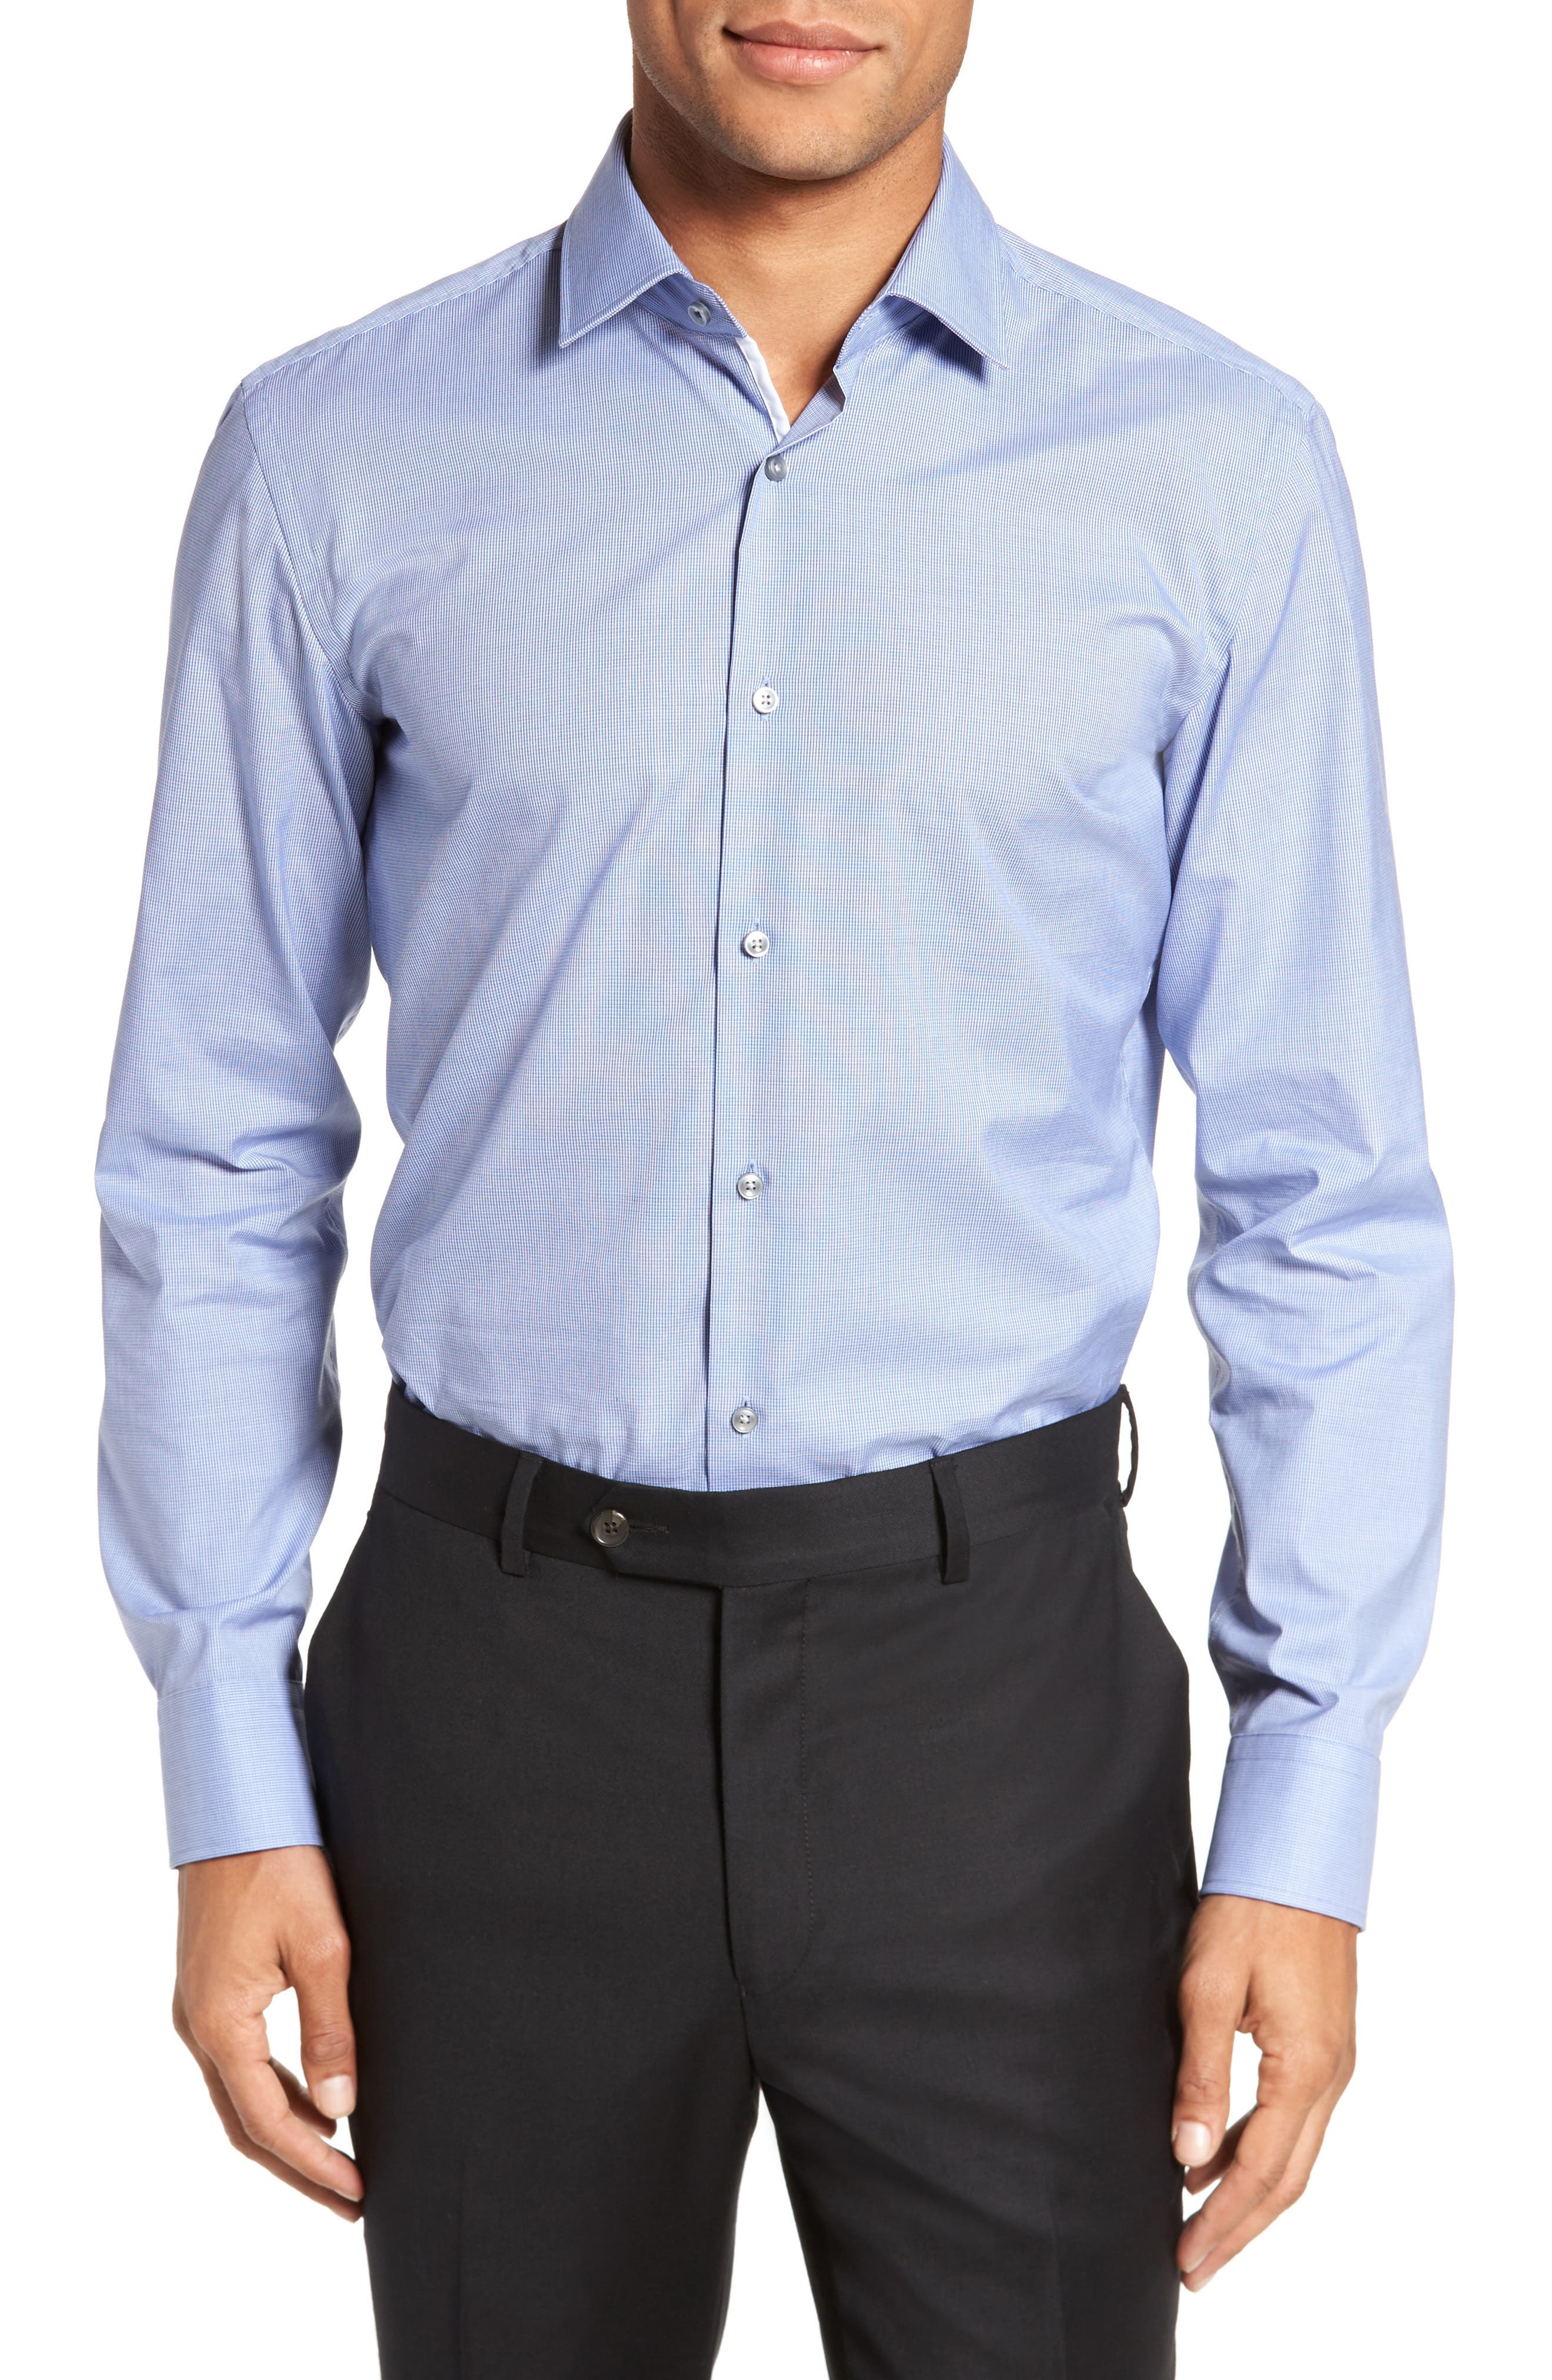 Jerris Slim Fit Easy Iron Check Dress Shirt,                             Main thumbnail 1, color,                             NAVY